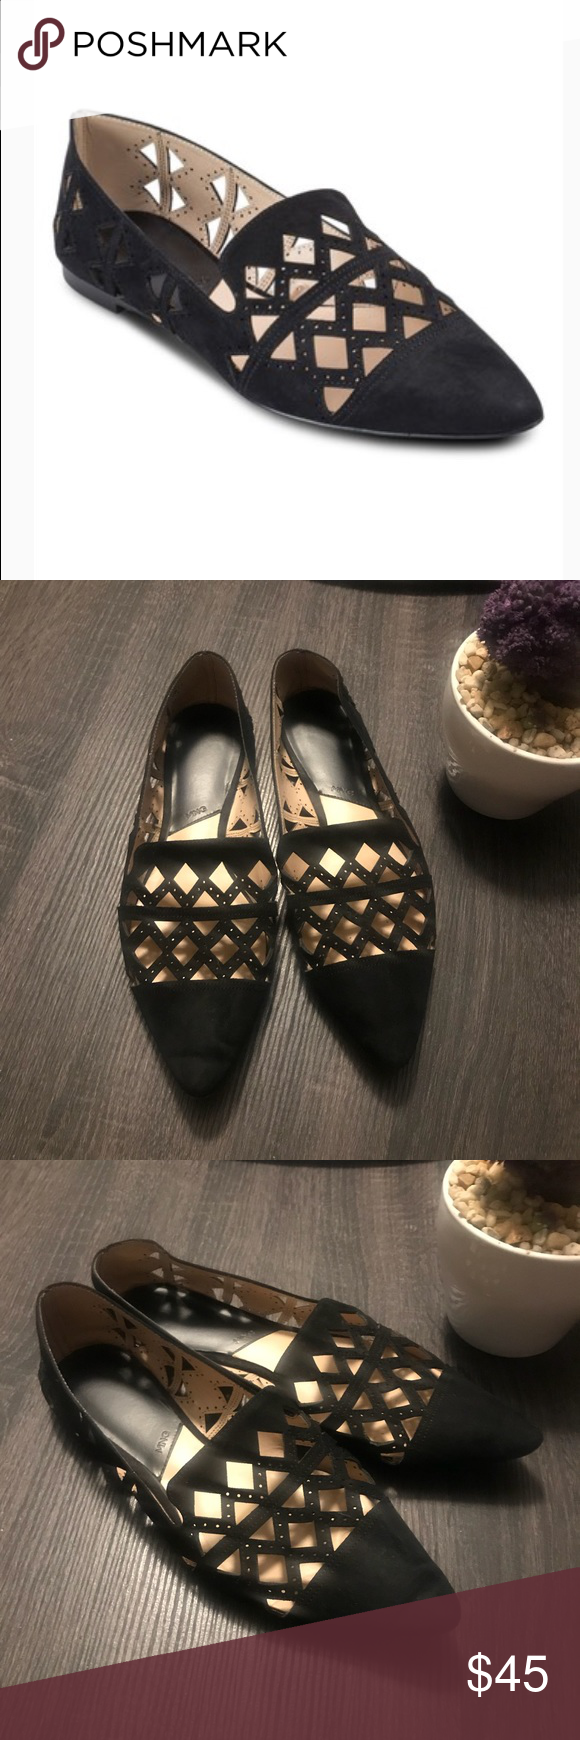 MNG Black Textile Cutout Pointy Loafers Flats 39 EIGENSCHAFTEN  Gr 39 85 oder 9 black